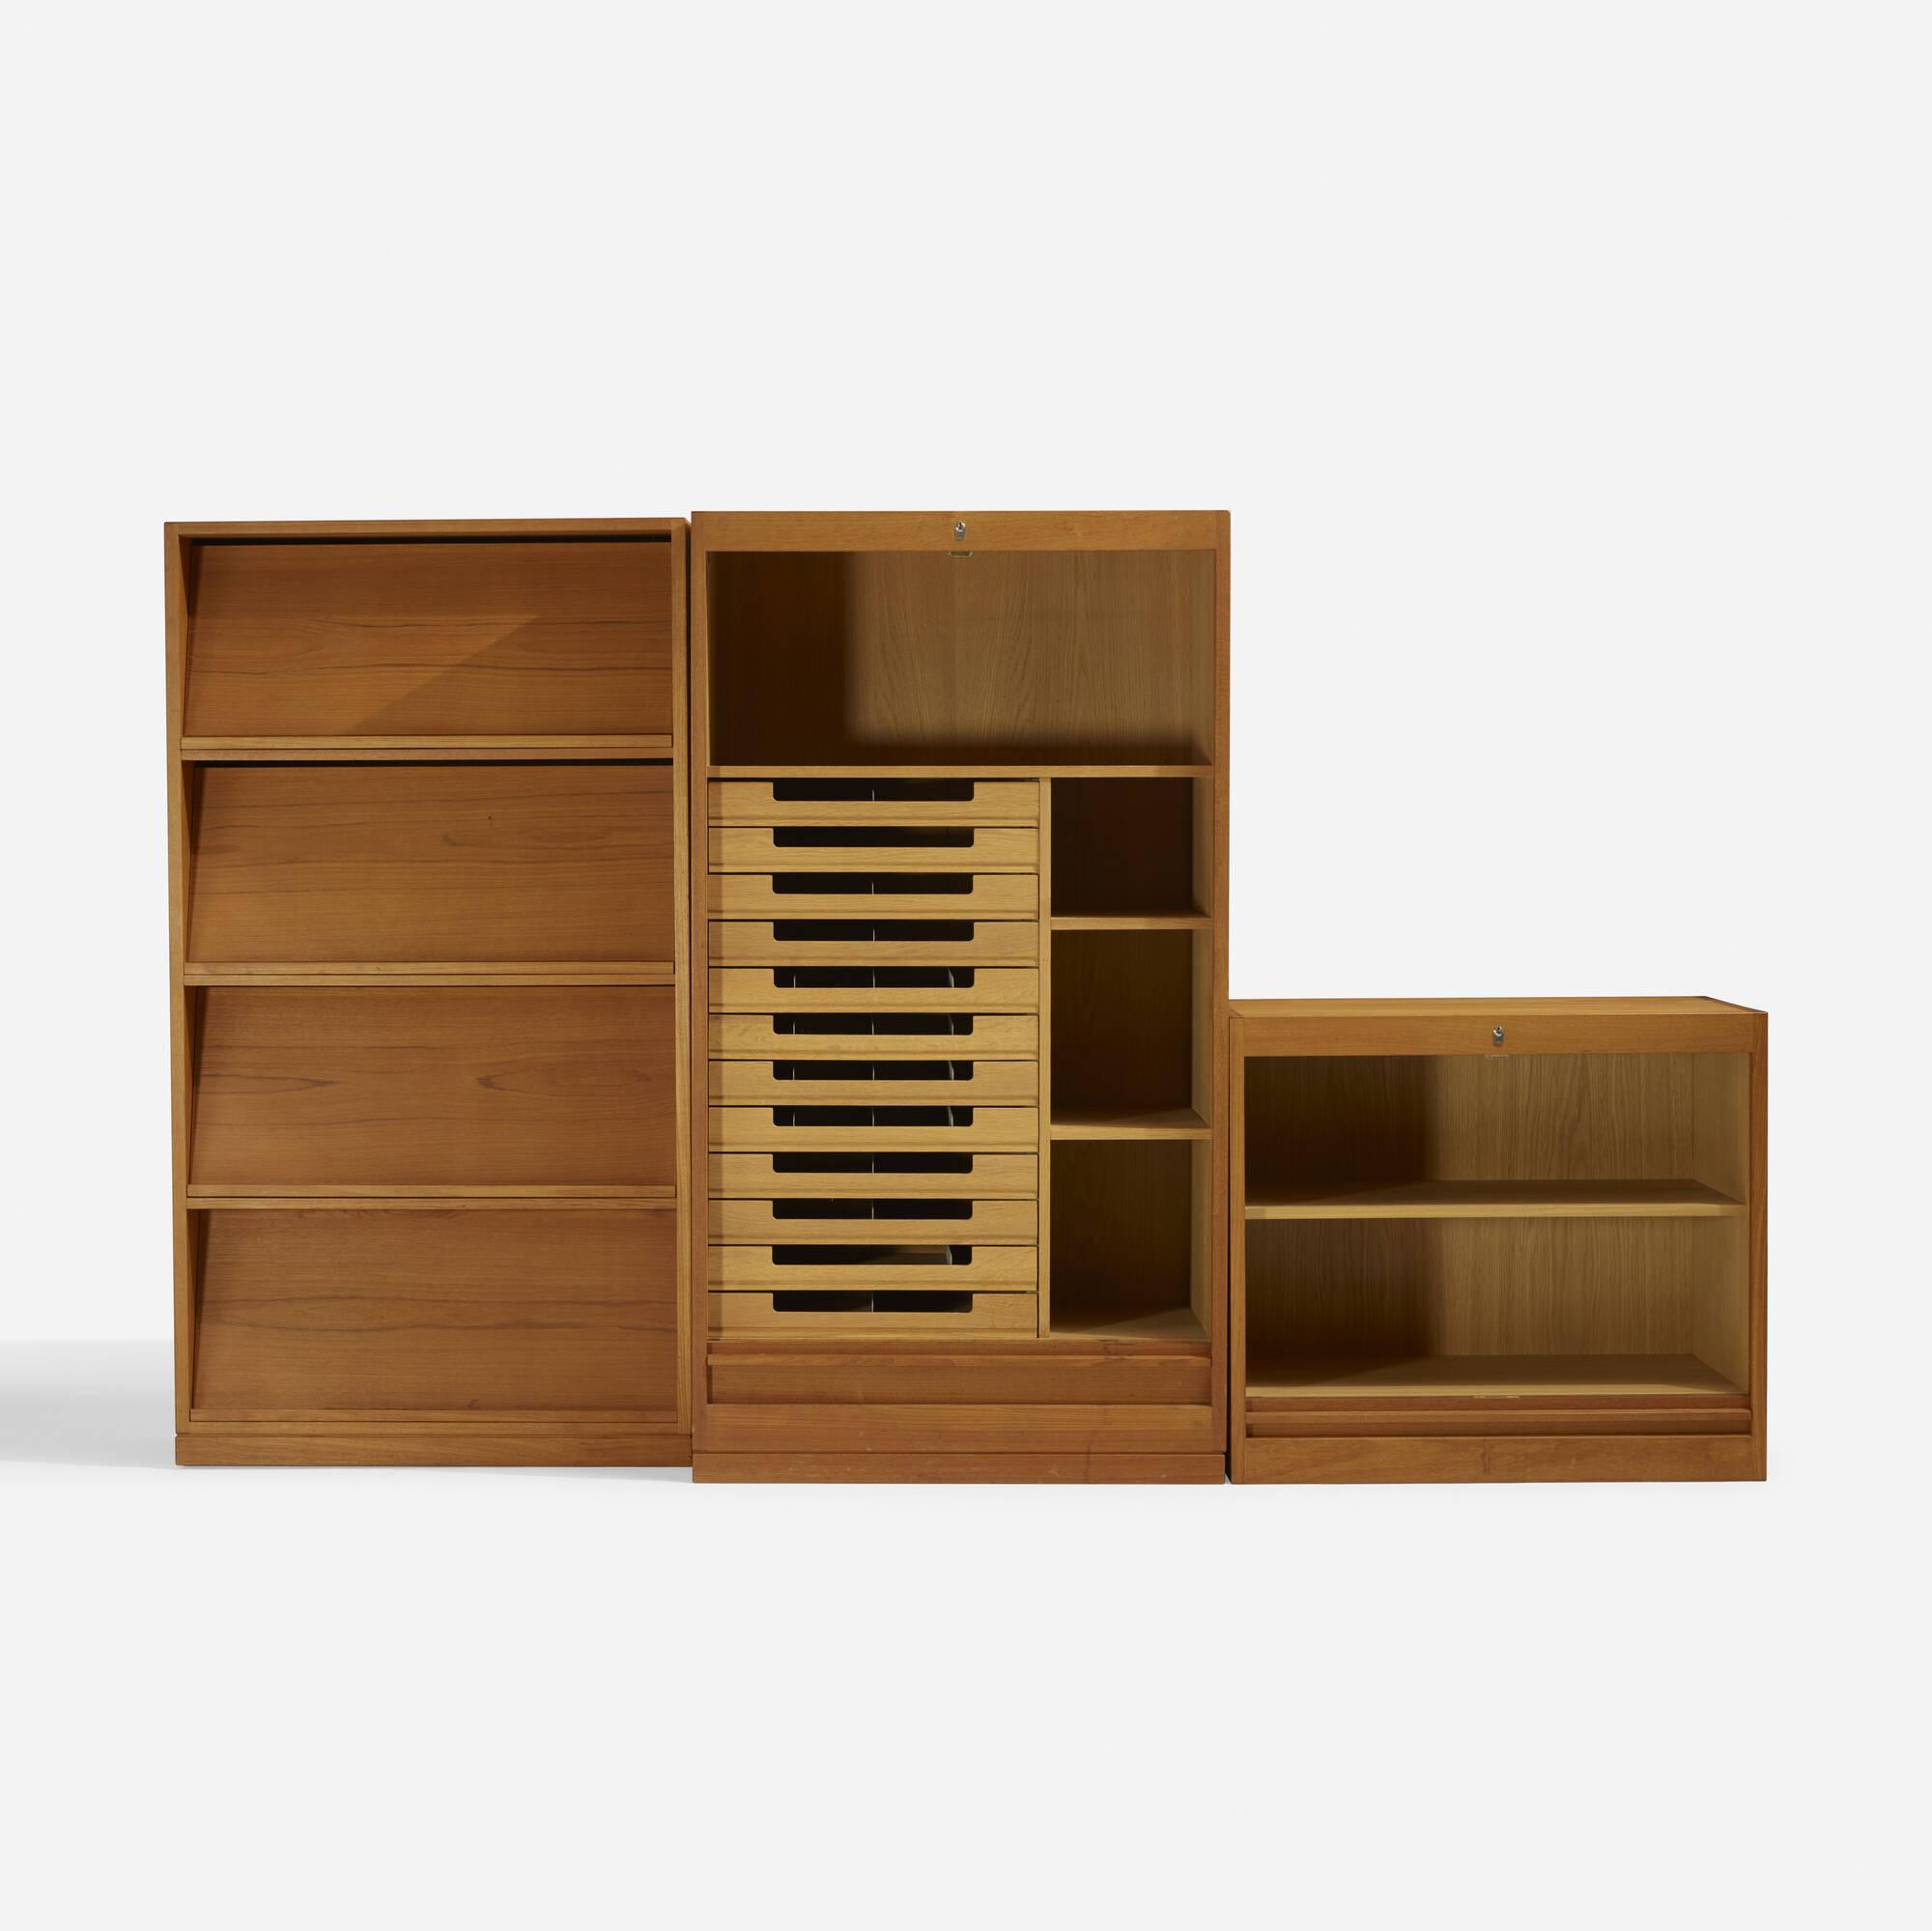 336: Hans J. Wegner / storage system (1 of 4)